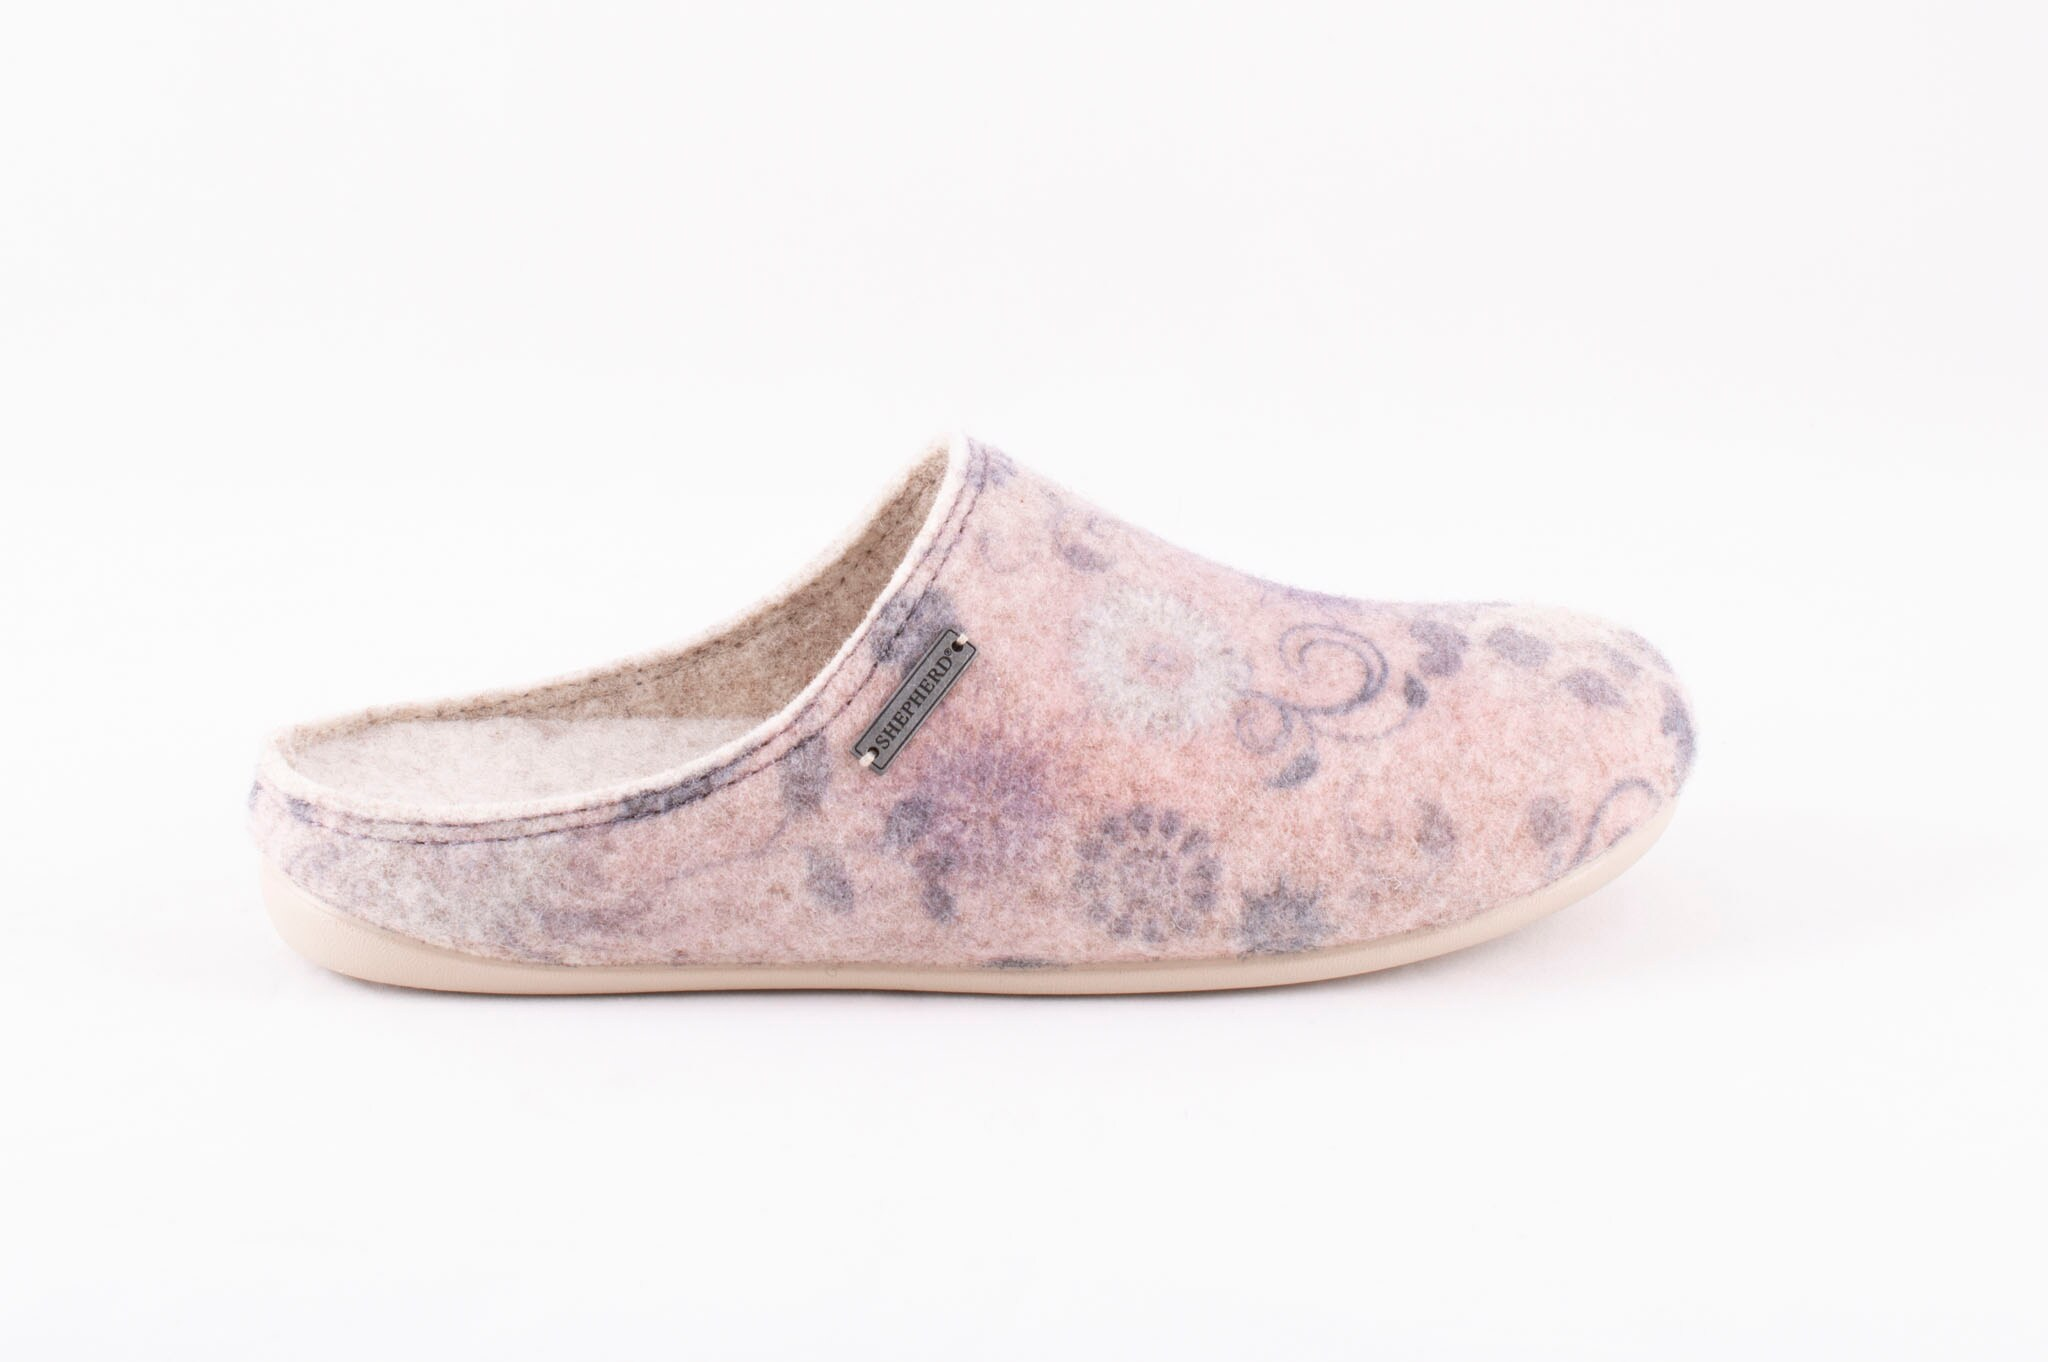 Cilla wool slippers Beige/paisley